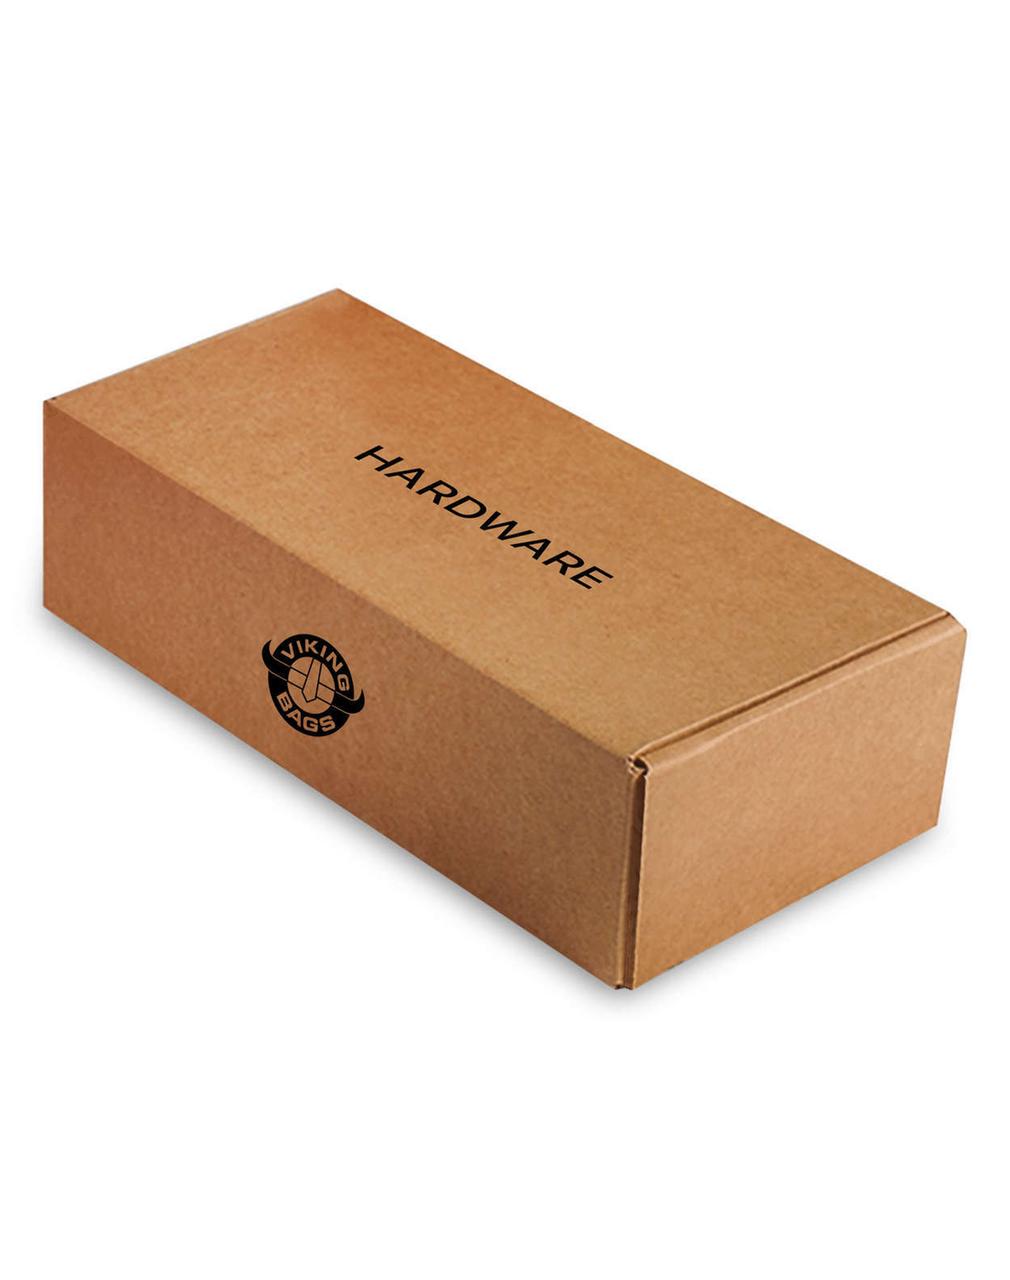 Triumph Thunderbird Single Strap Shock Cutout Slanted Large Motorcycle Saddlebags Box